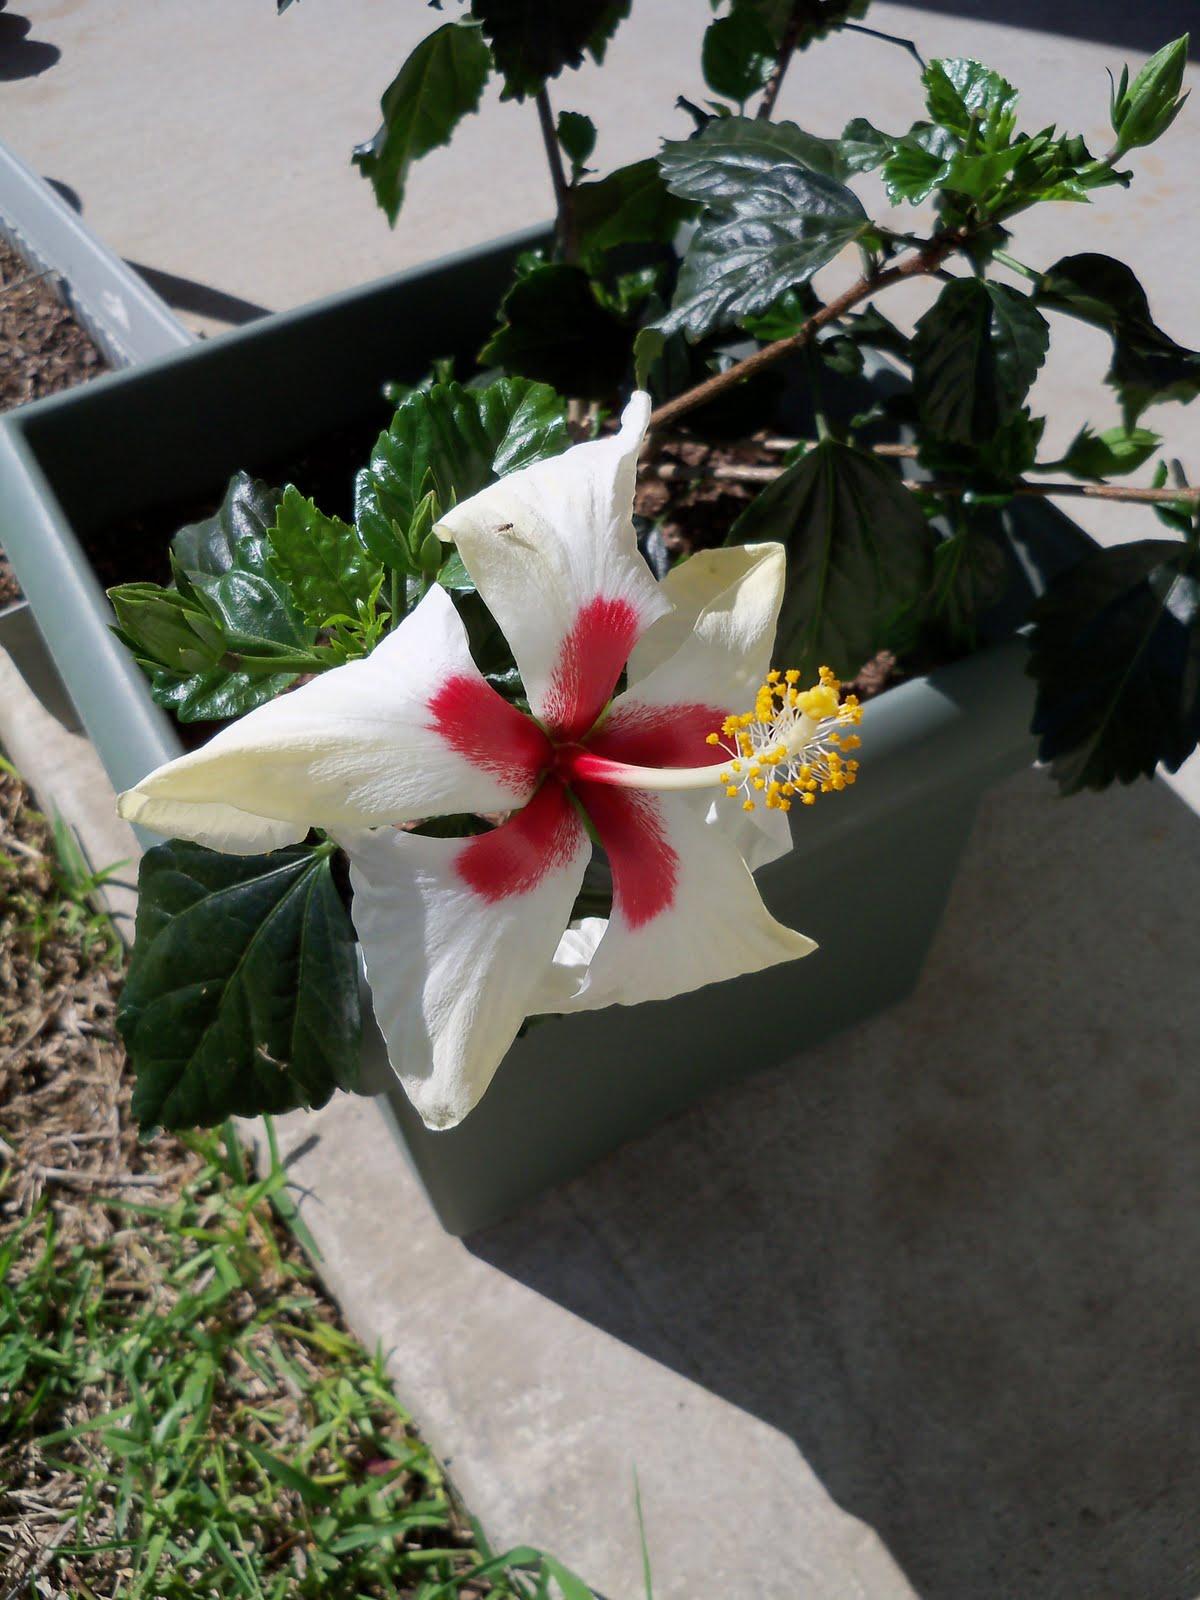 Gardening 2010 - 101_1356.JPG